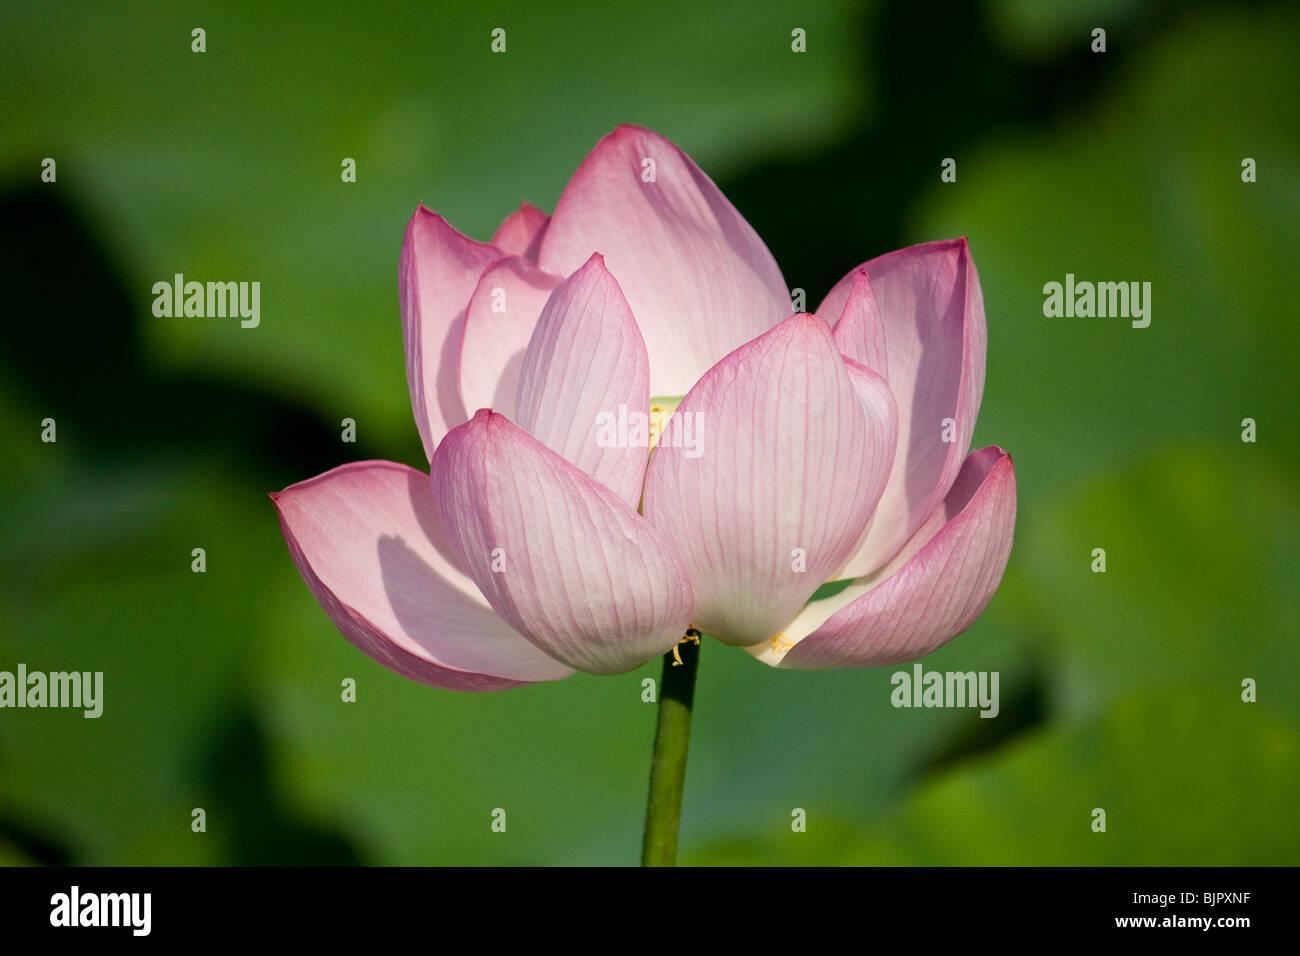 Green Lotus Flower Stock Photos Green Lotus Flower Stock Images